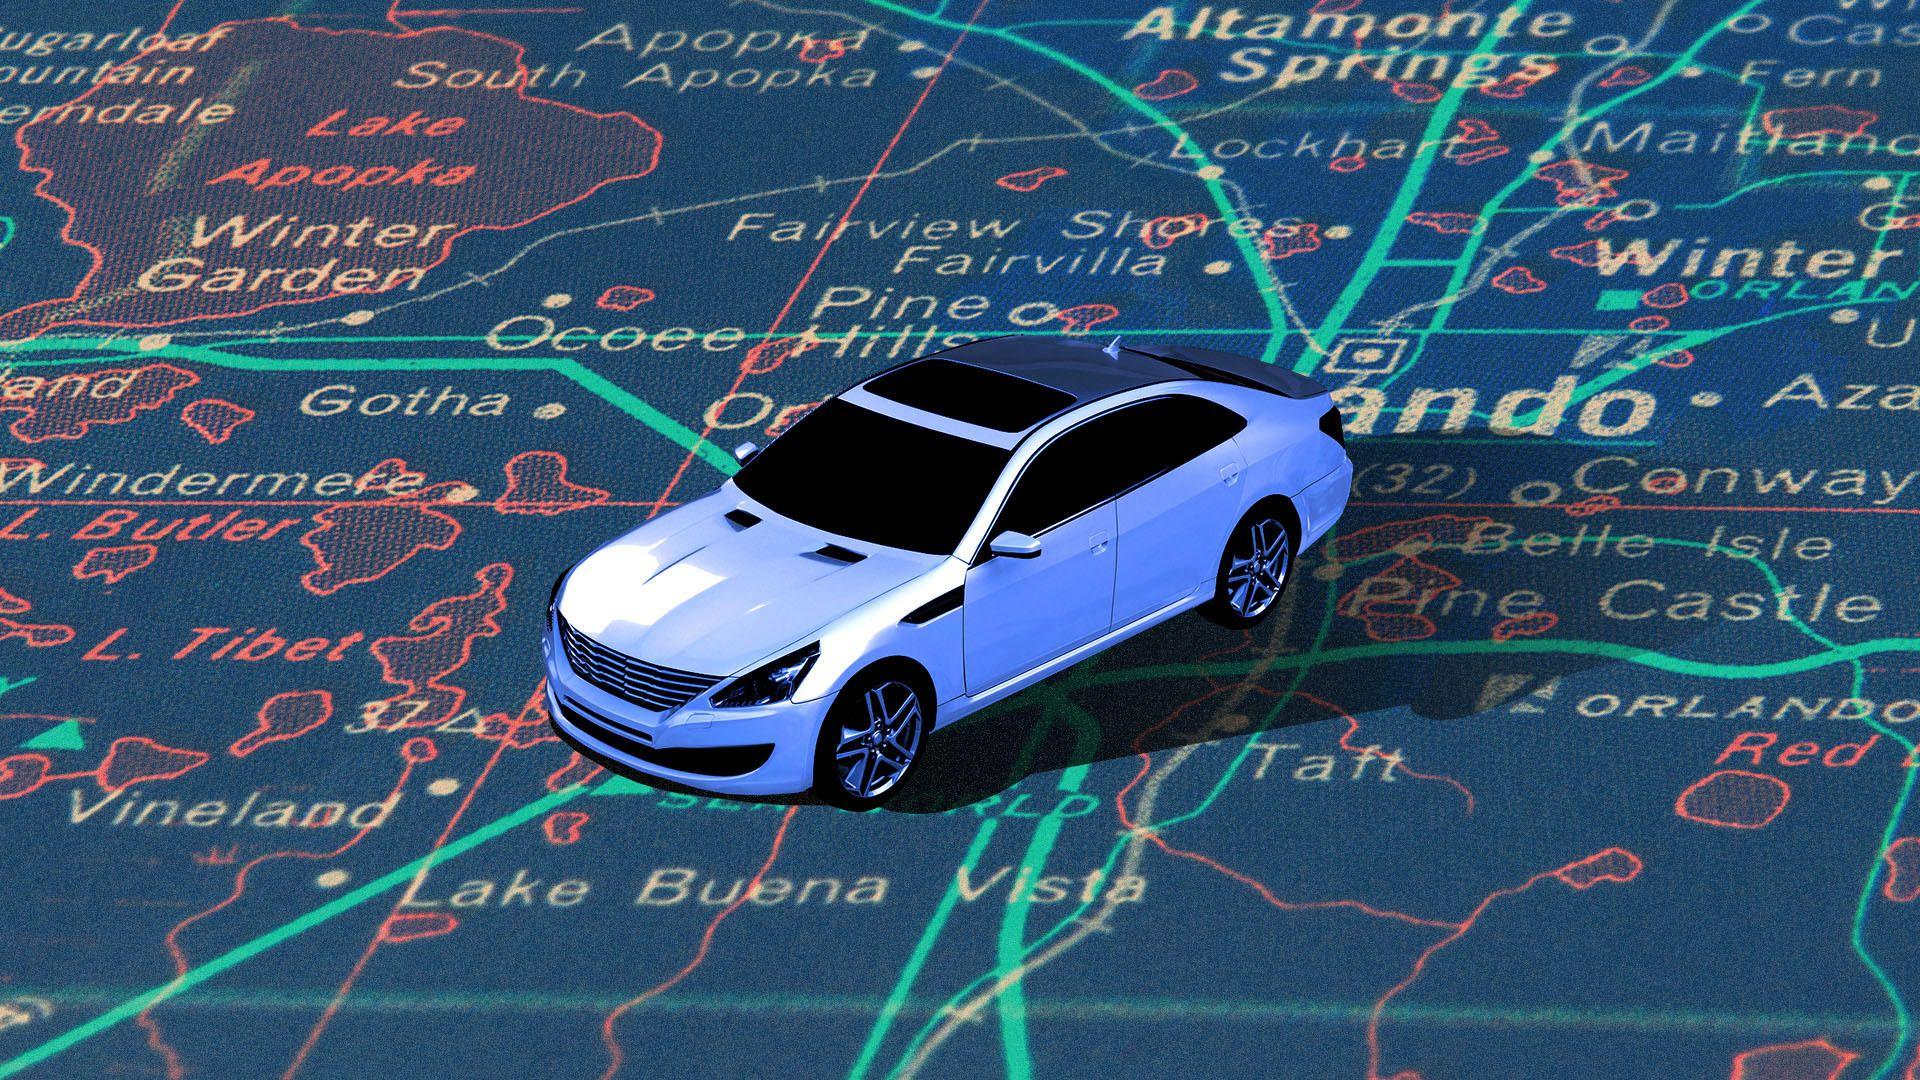 Illustration of car on a map of Orlando, Florida.